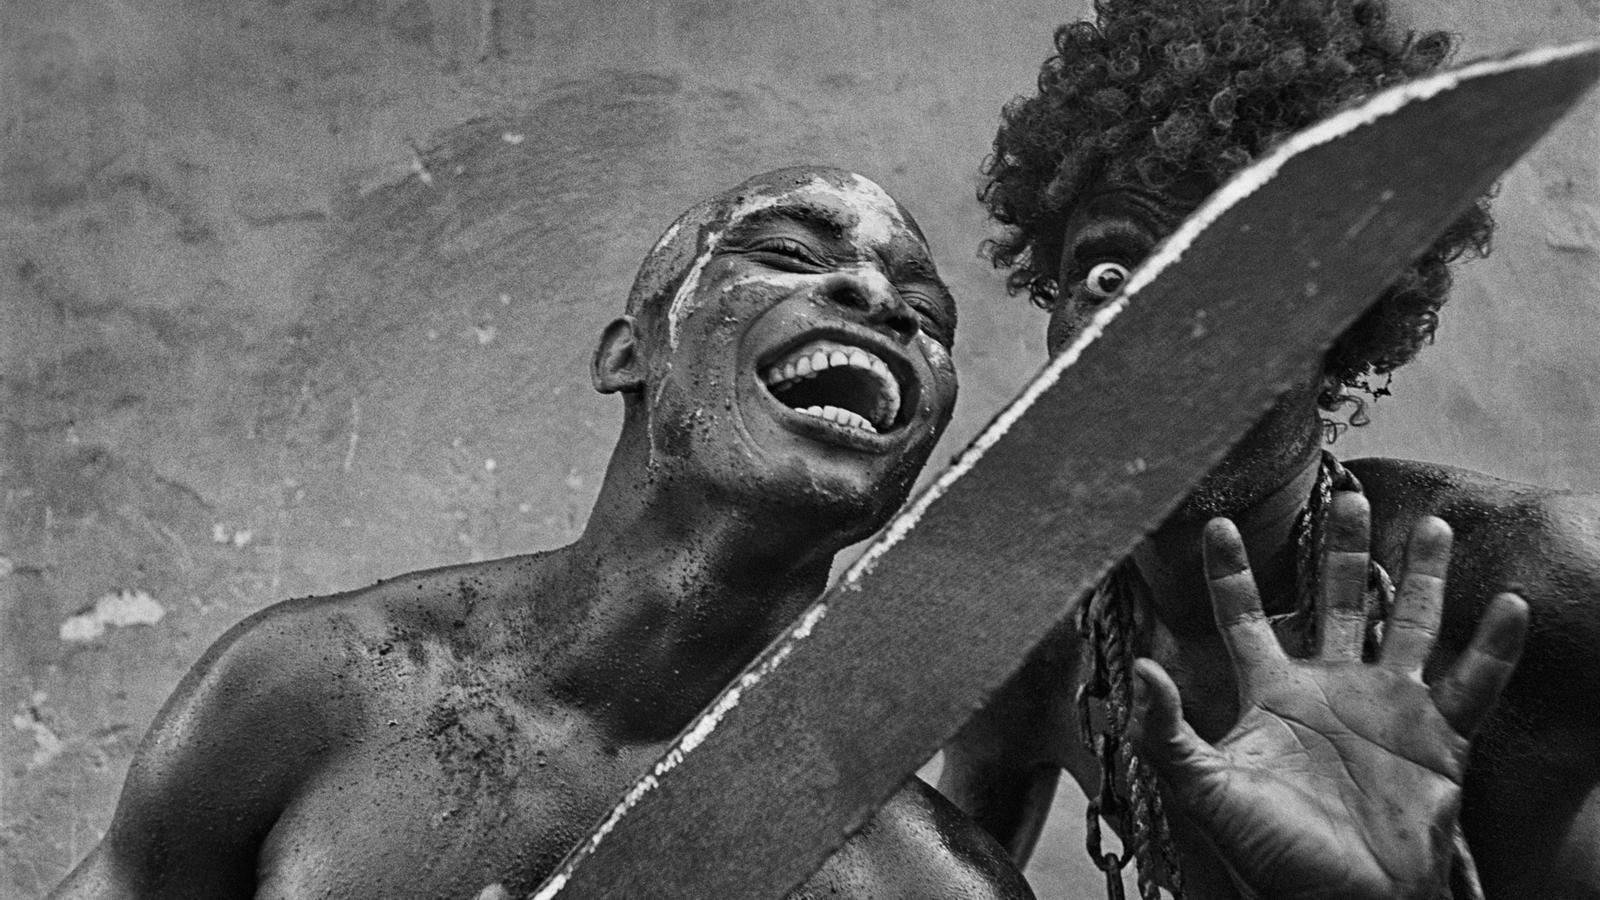 'Encadenat',  Haití, Carnaval de Jacmel', de Cristina García Rodero